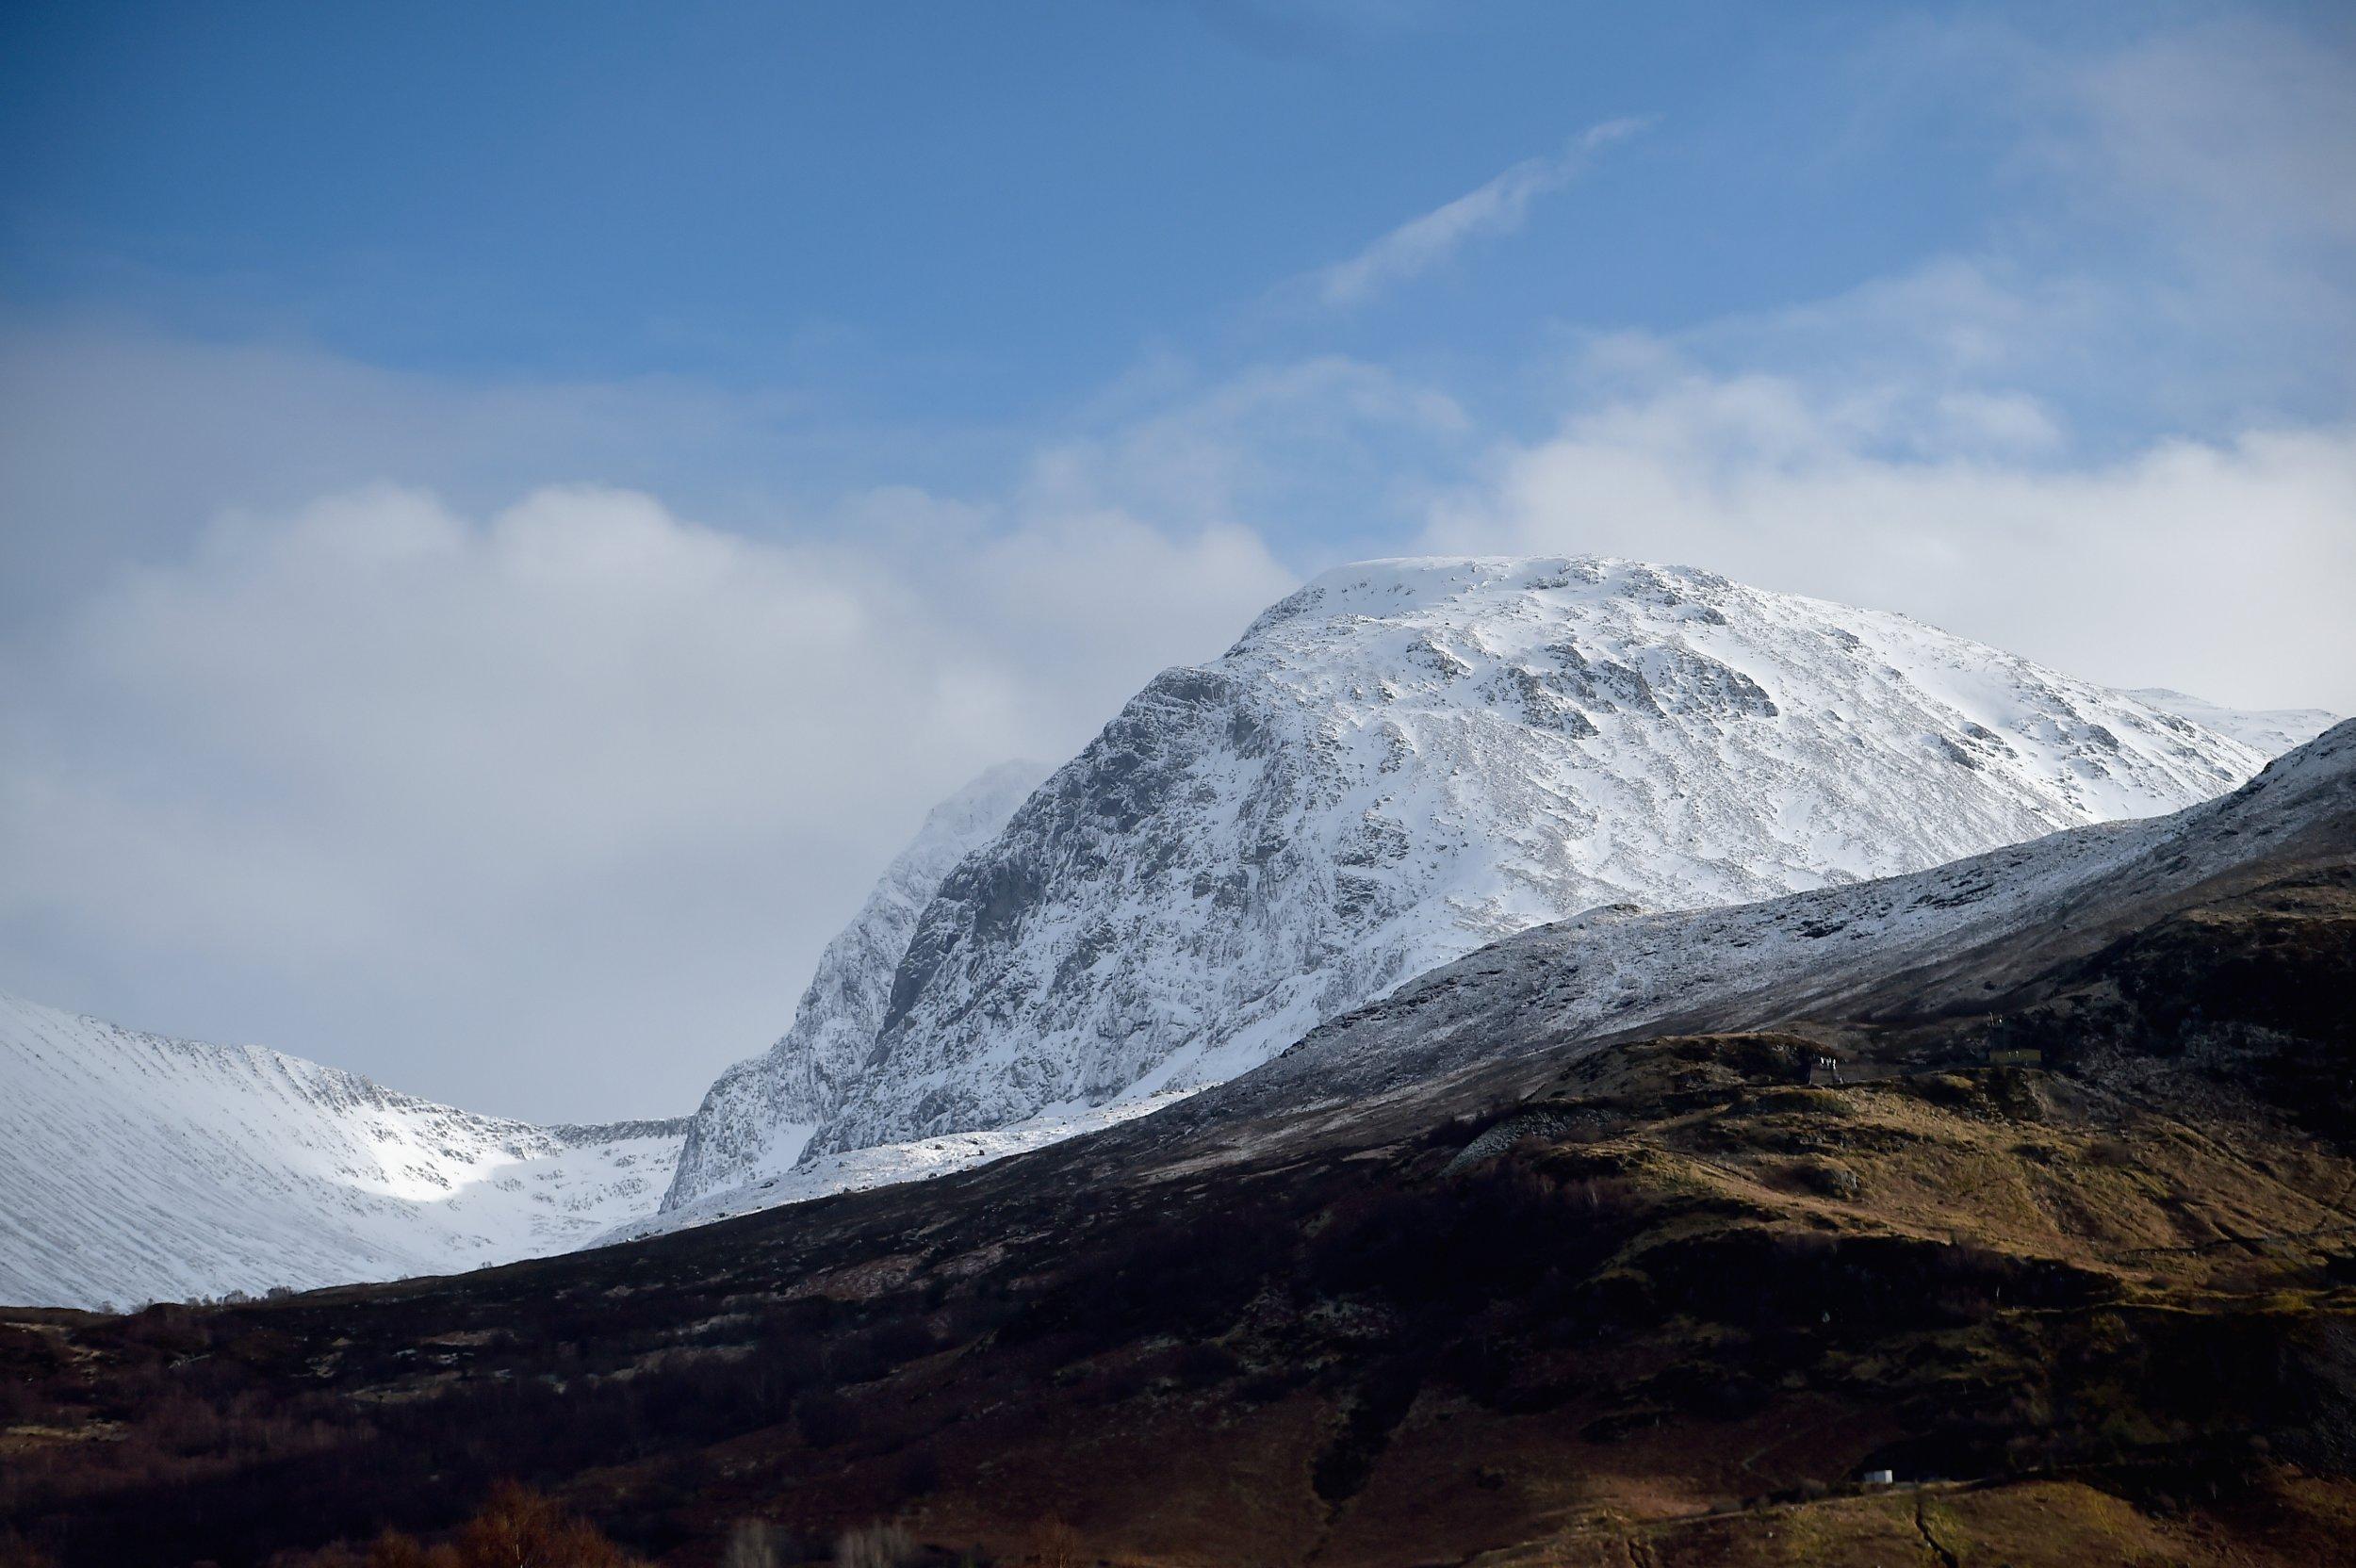 Britain's Tallest Mountain Just Got Taller